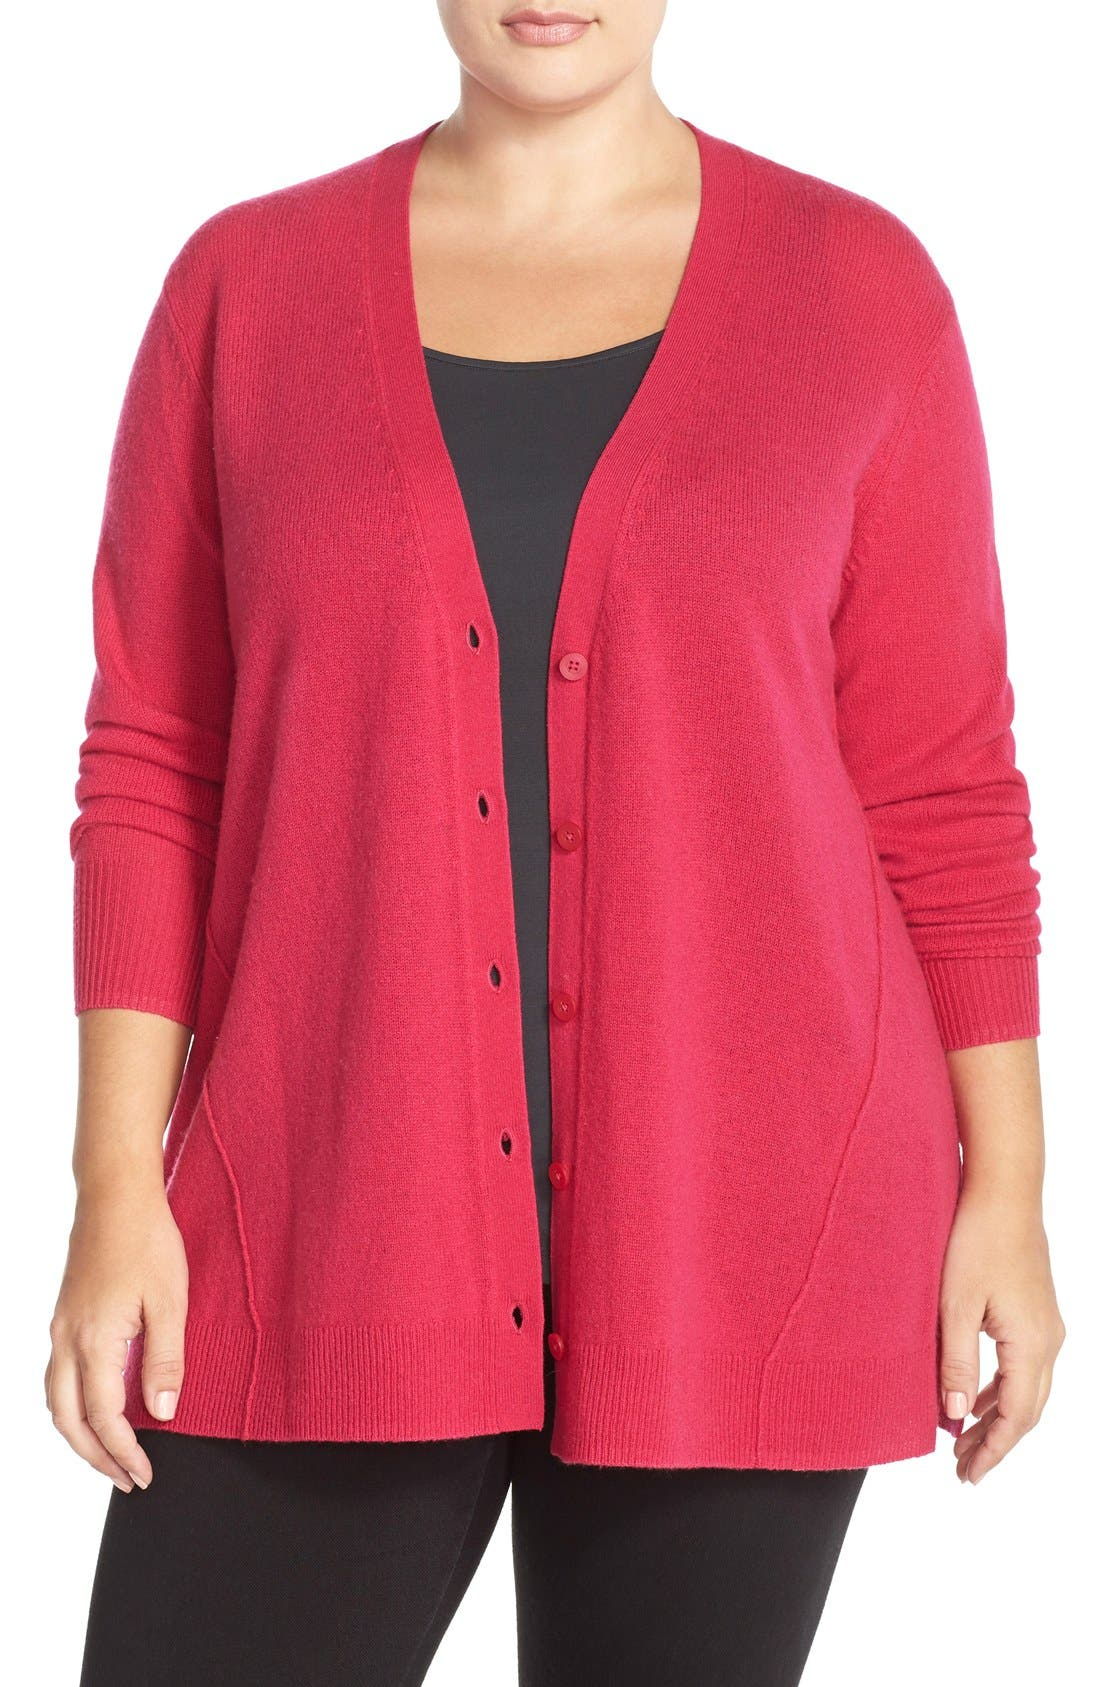 Main Image - Sejour Wool & Cashmere Trapeze Cardigan (Plus Size)